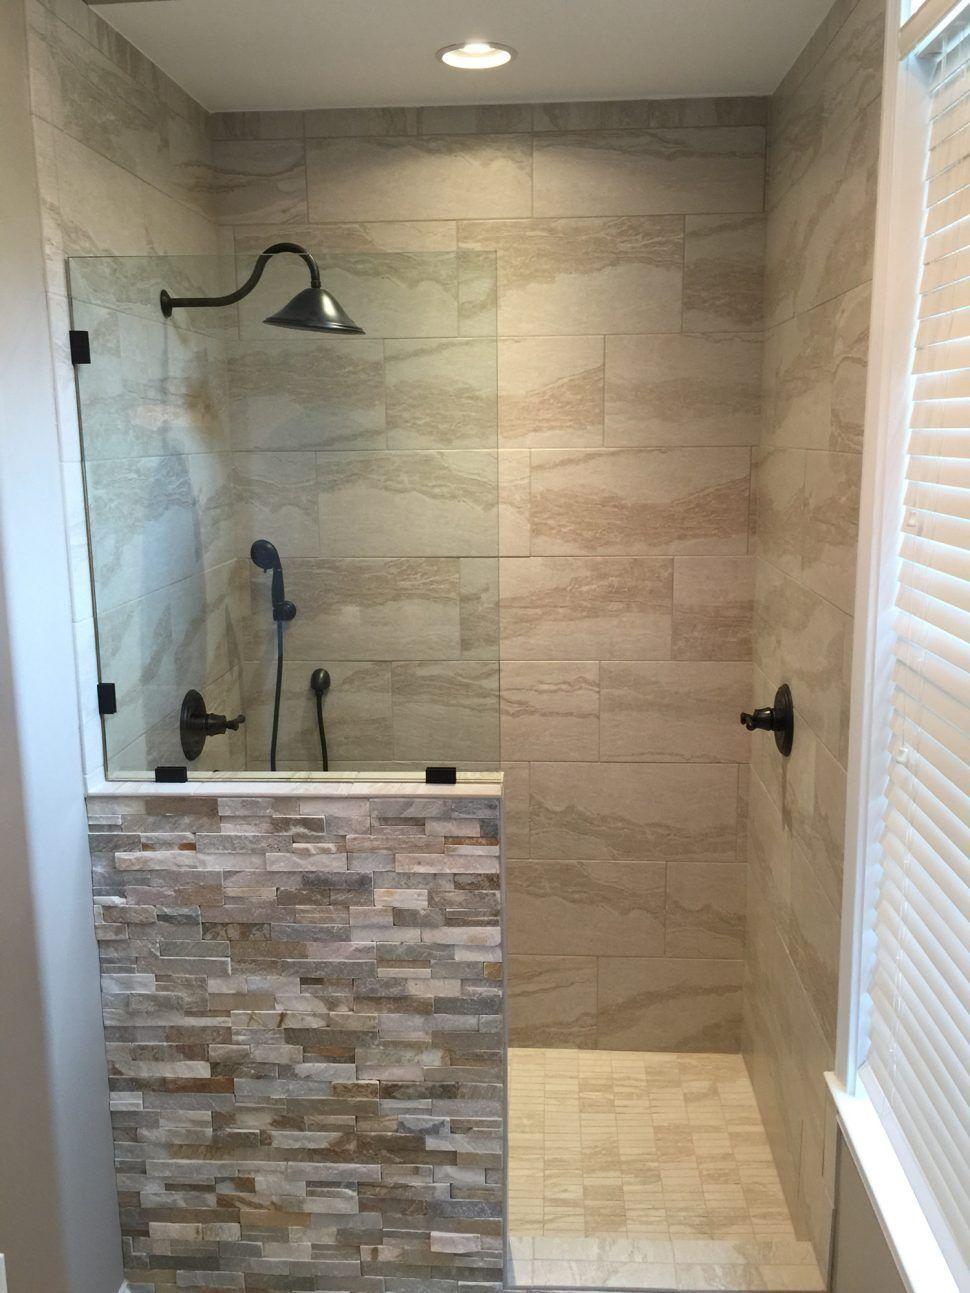 Incredible Bathroom Bathroom Modern Walk In Shower Ideas With Doorless Download Free Architecture Designs Scobabritishbridgeorg